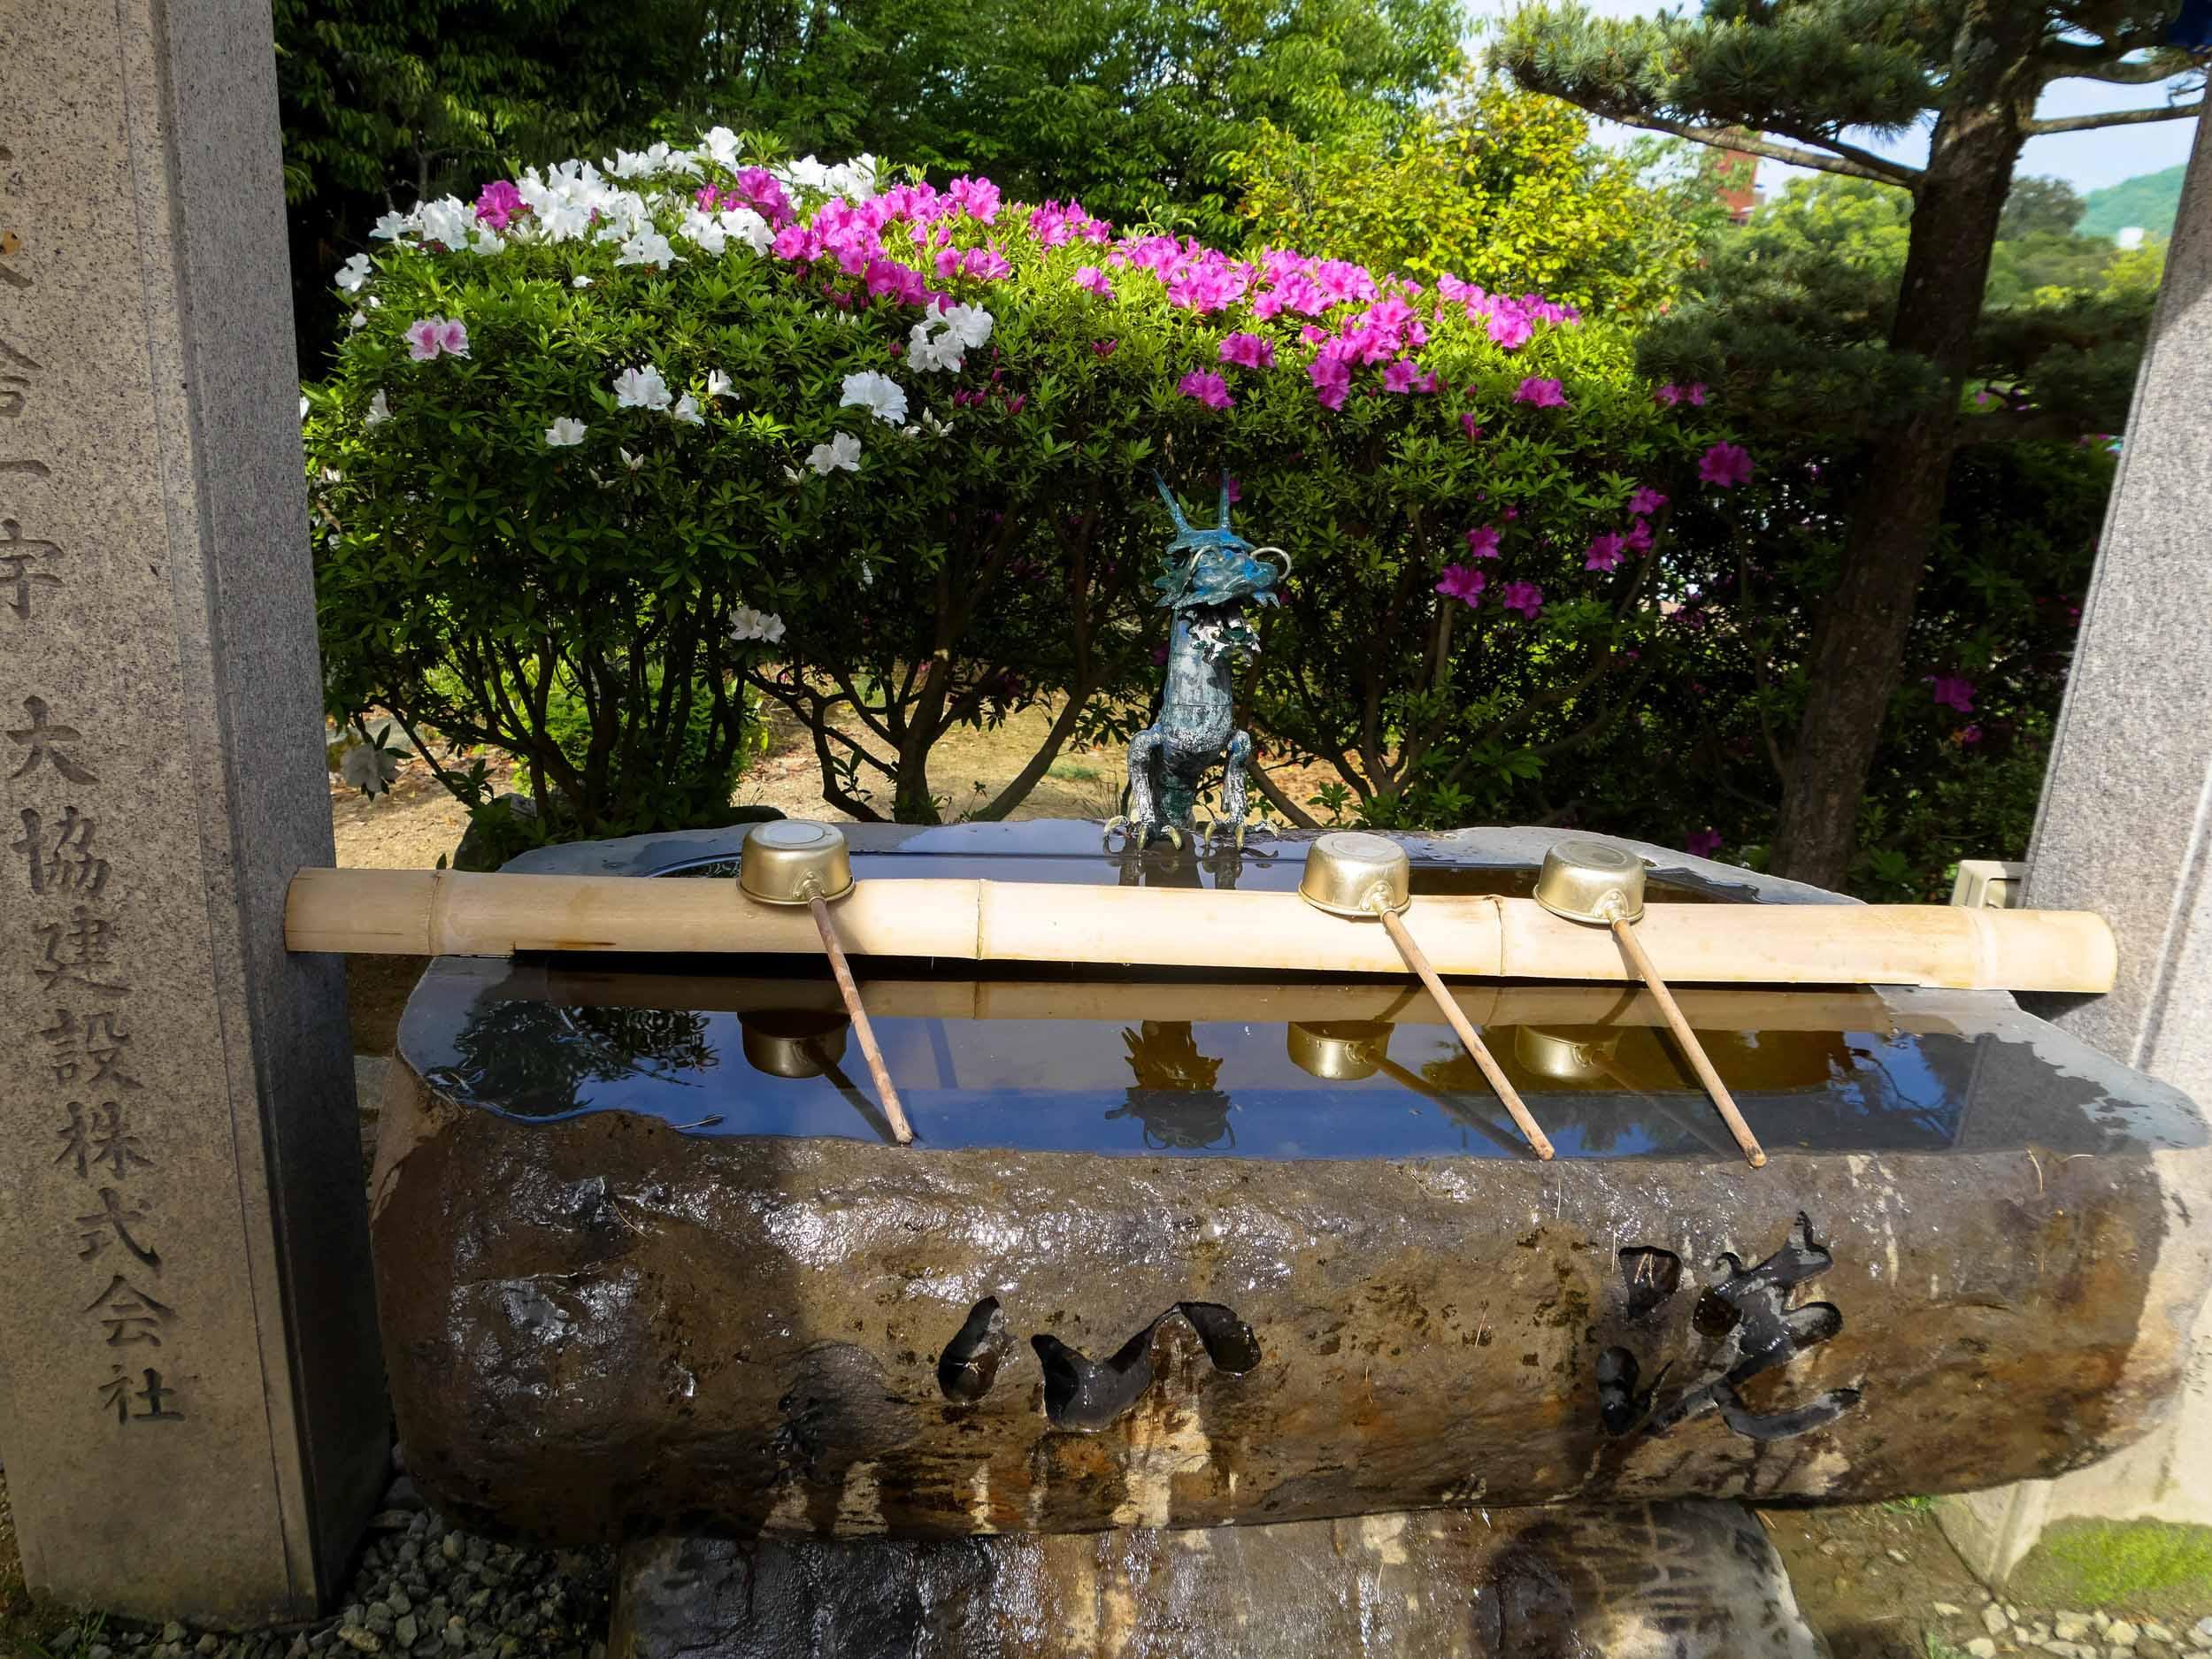 matsuyama-dougo-onsen-26.jpg